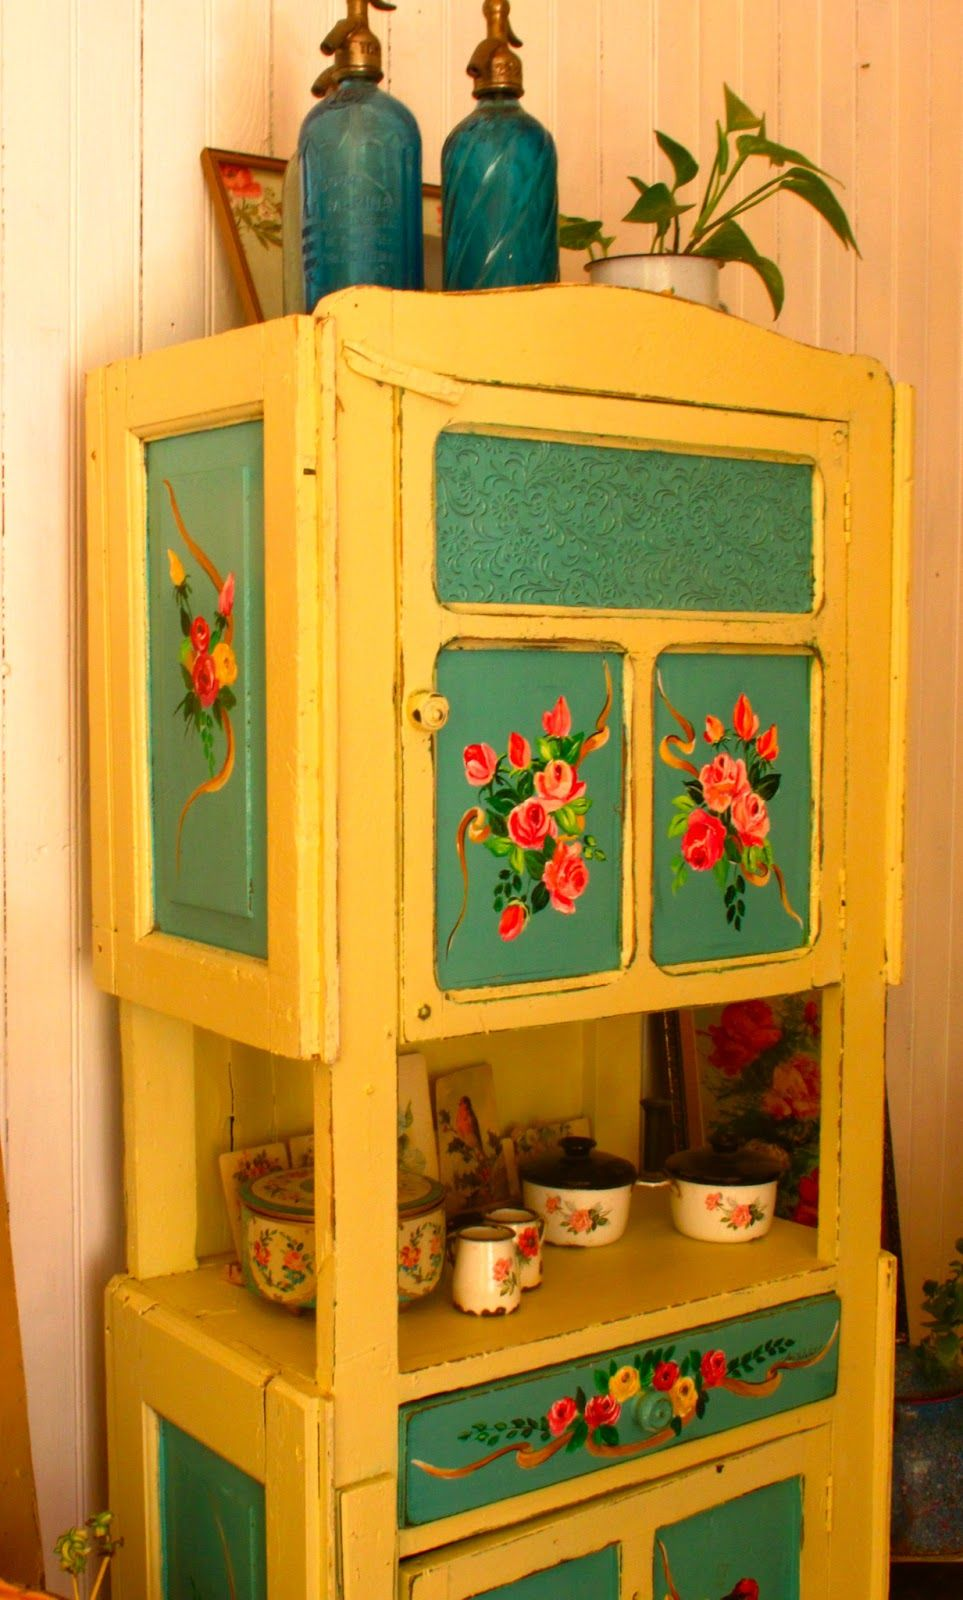 las vidalas painted papered furniture pinterest paint furniture house and interiors. Black Bedroom Furniture Sets. Home Design Ideas